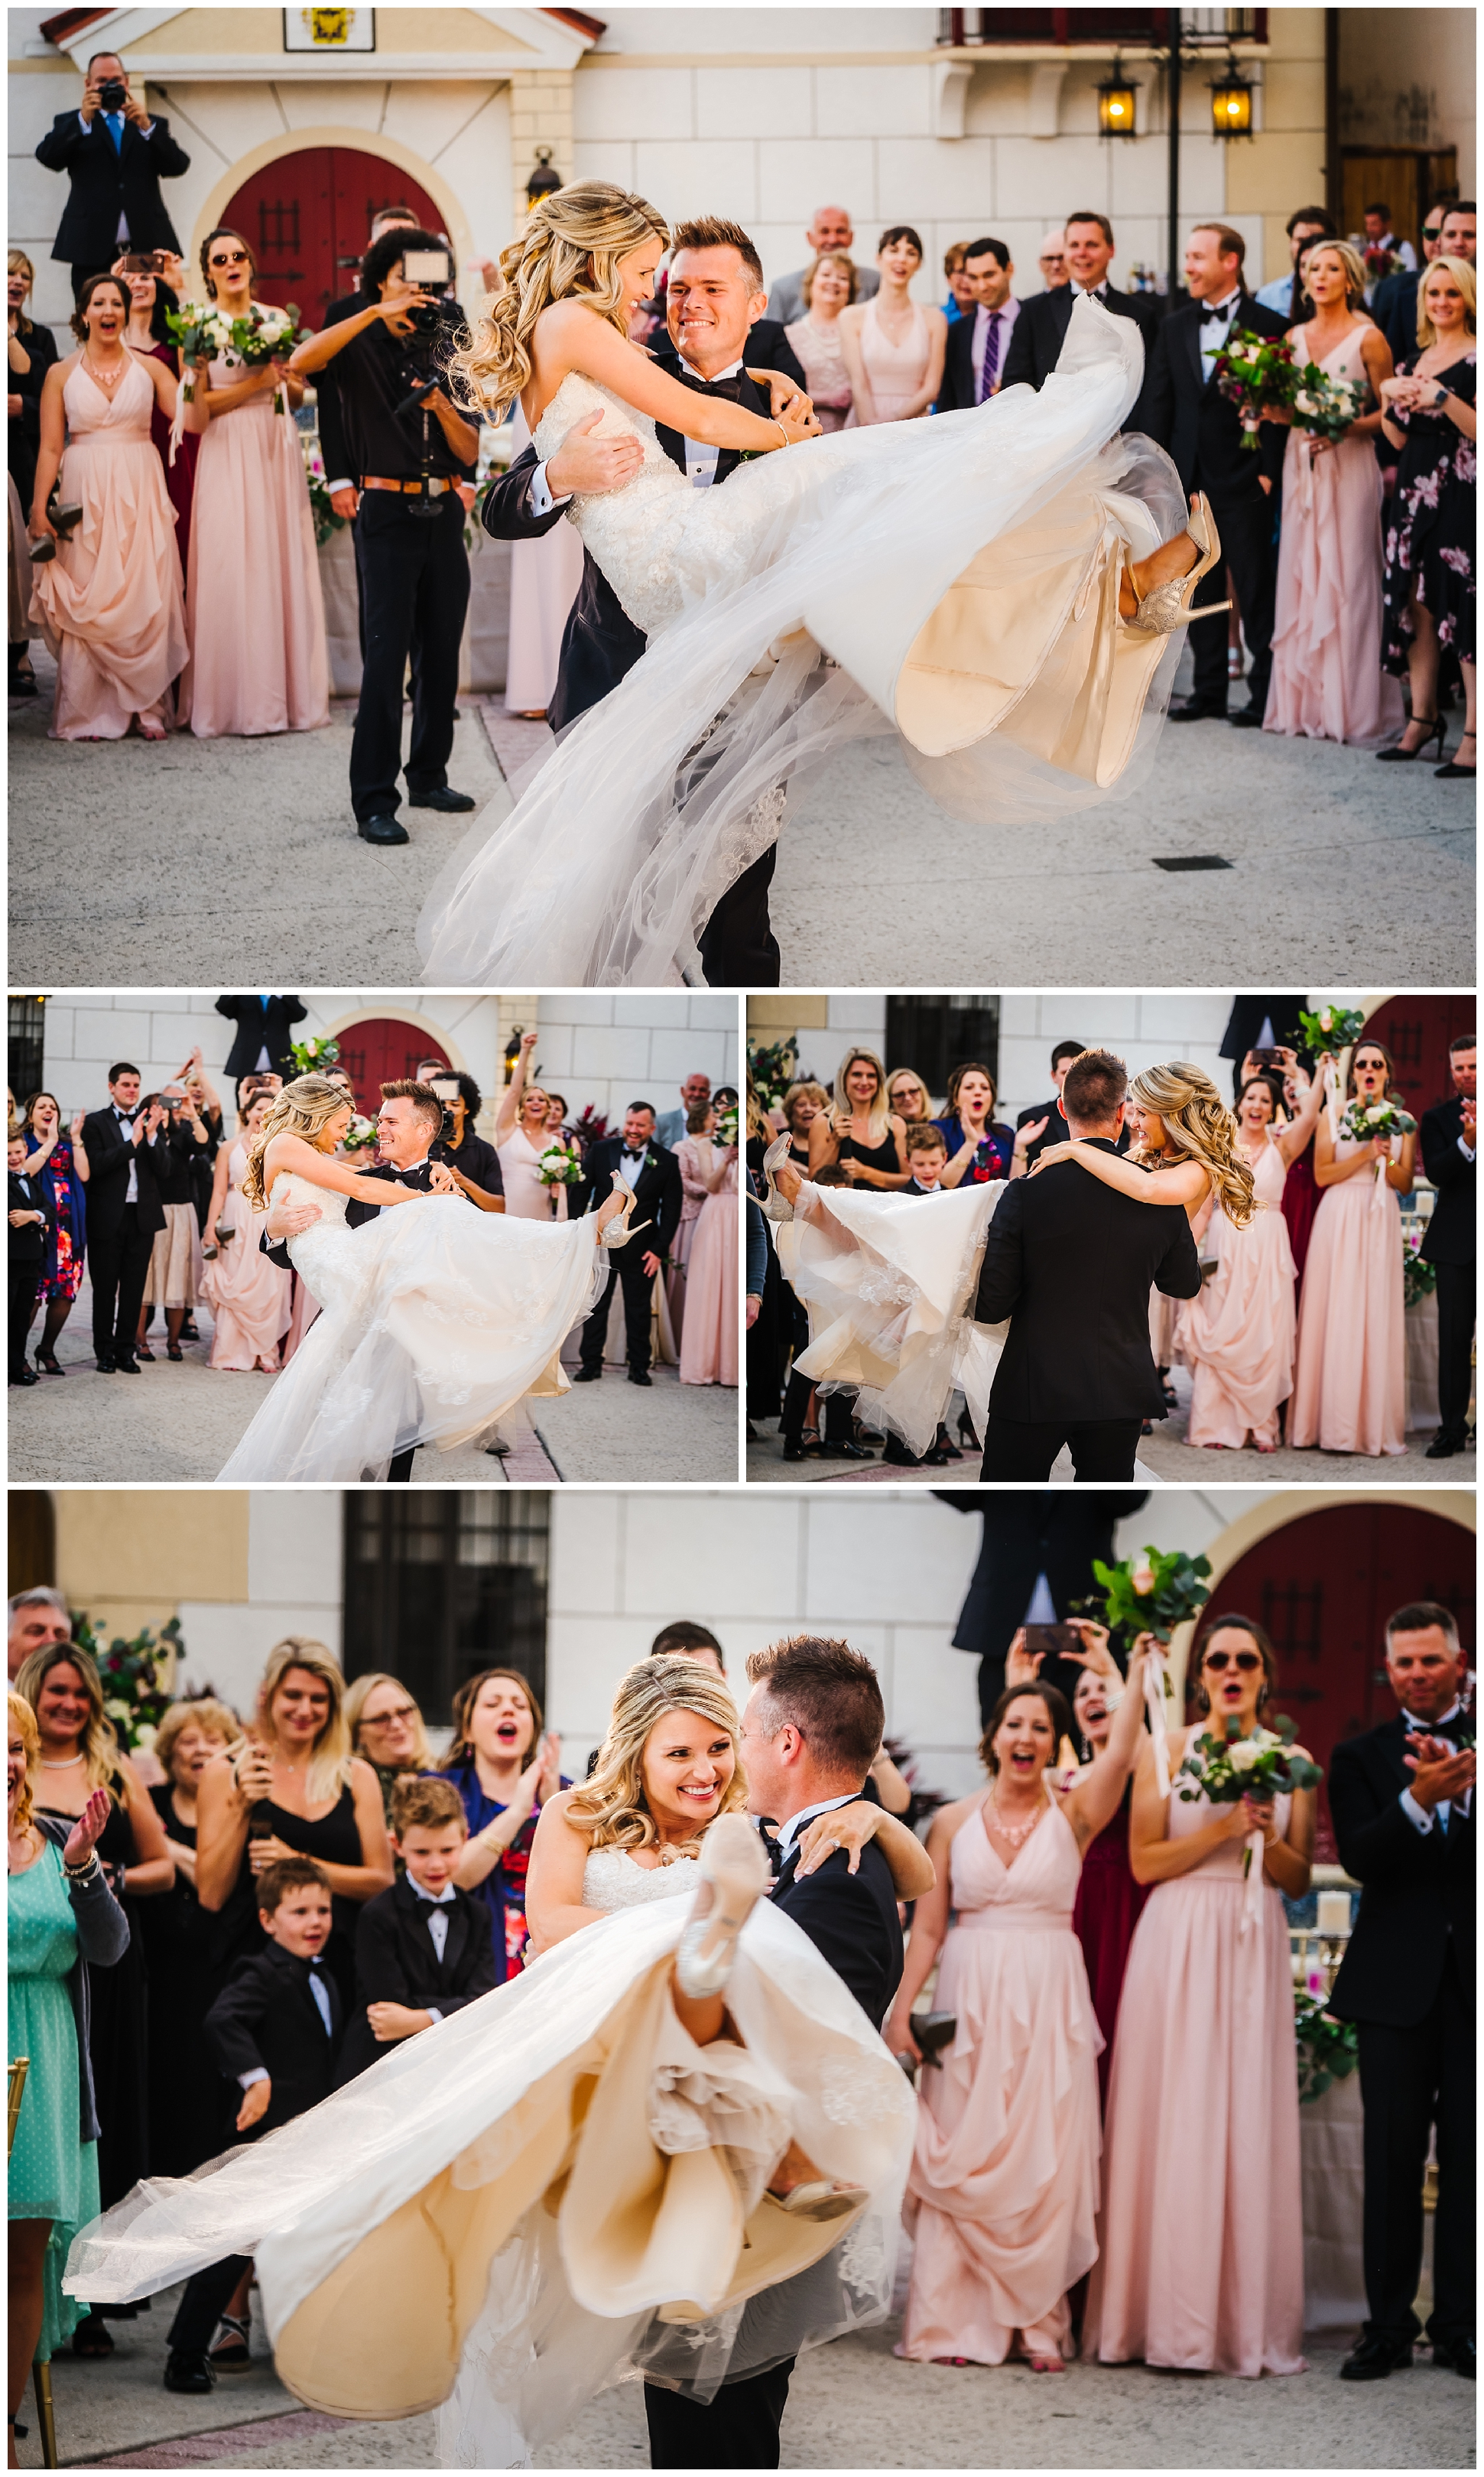 tampa-bradenton-wedding-photographer-south-florida-museum-classic-blush-gold-alpacas-sparklers_0073.jpg